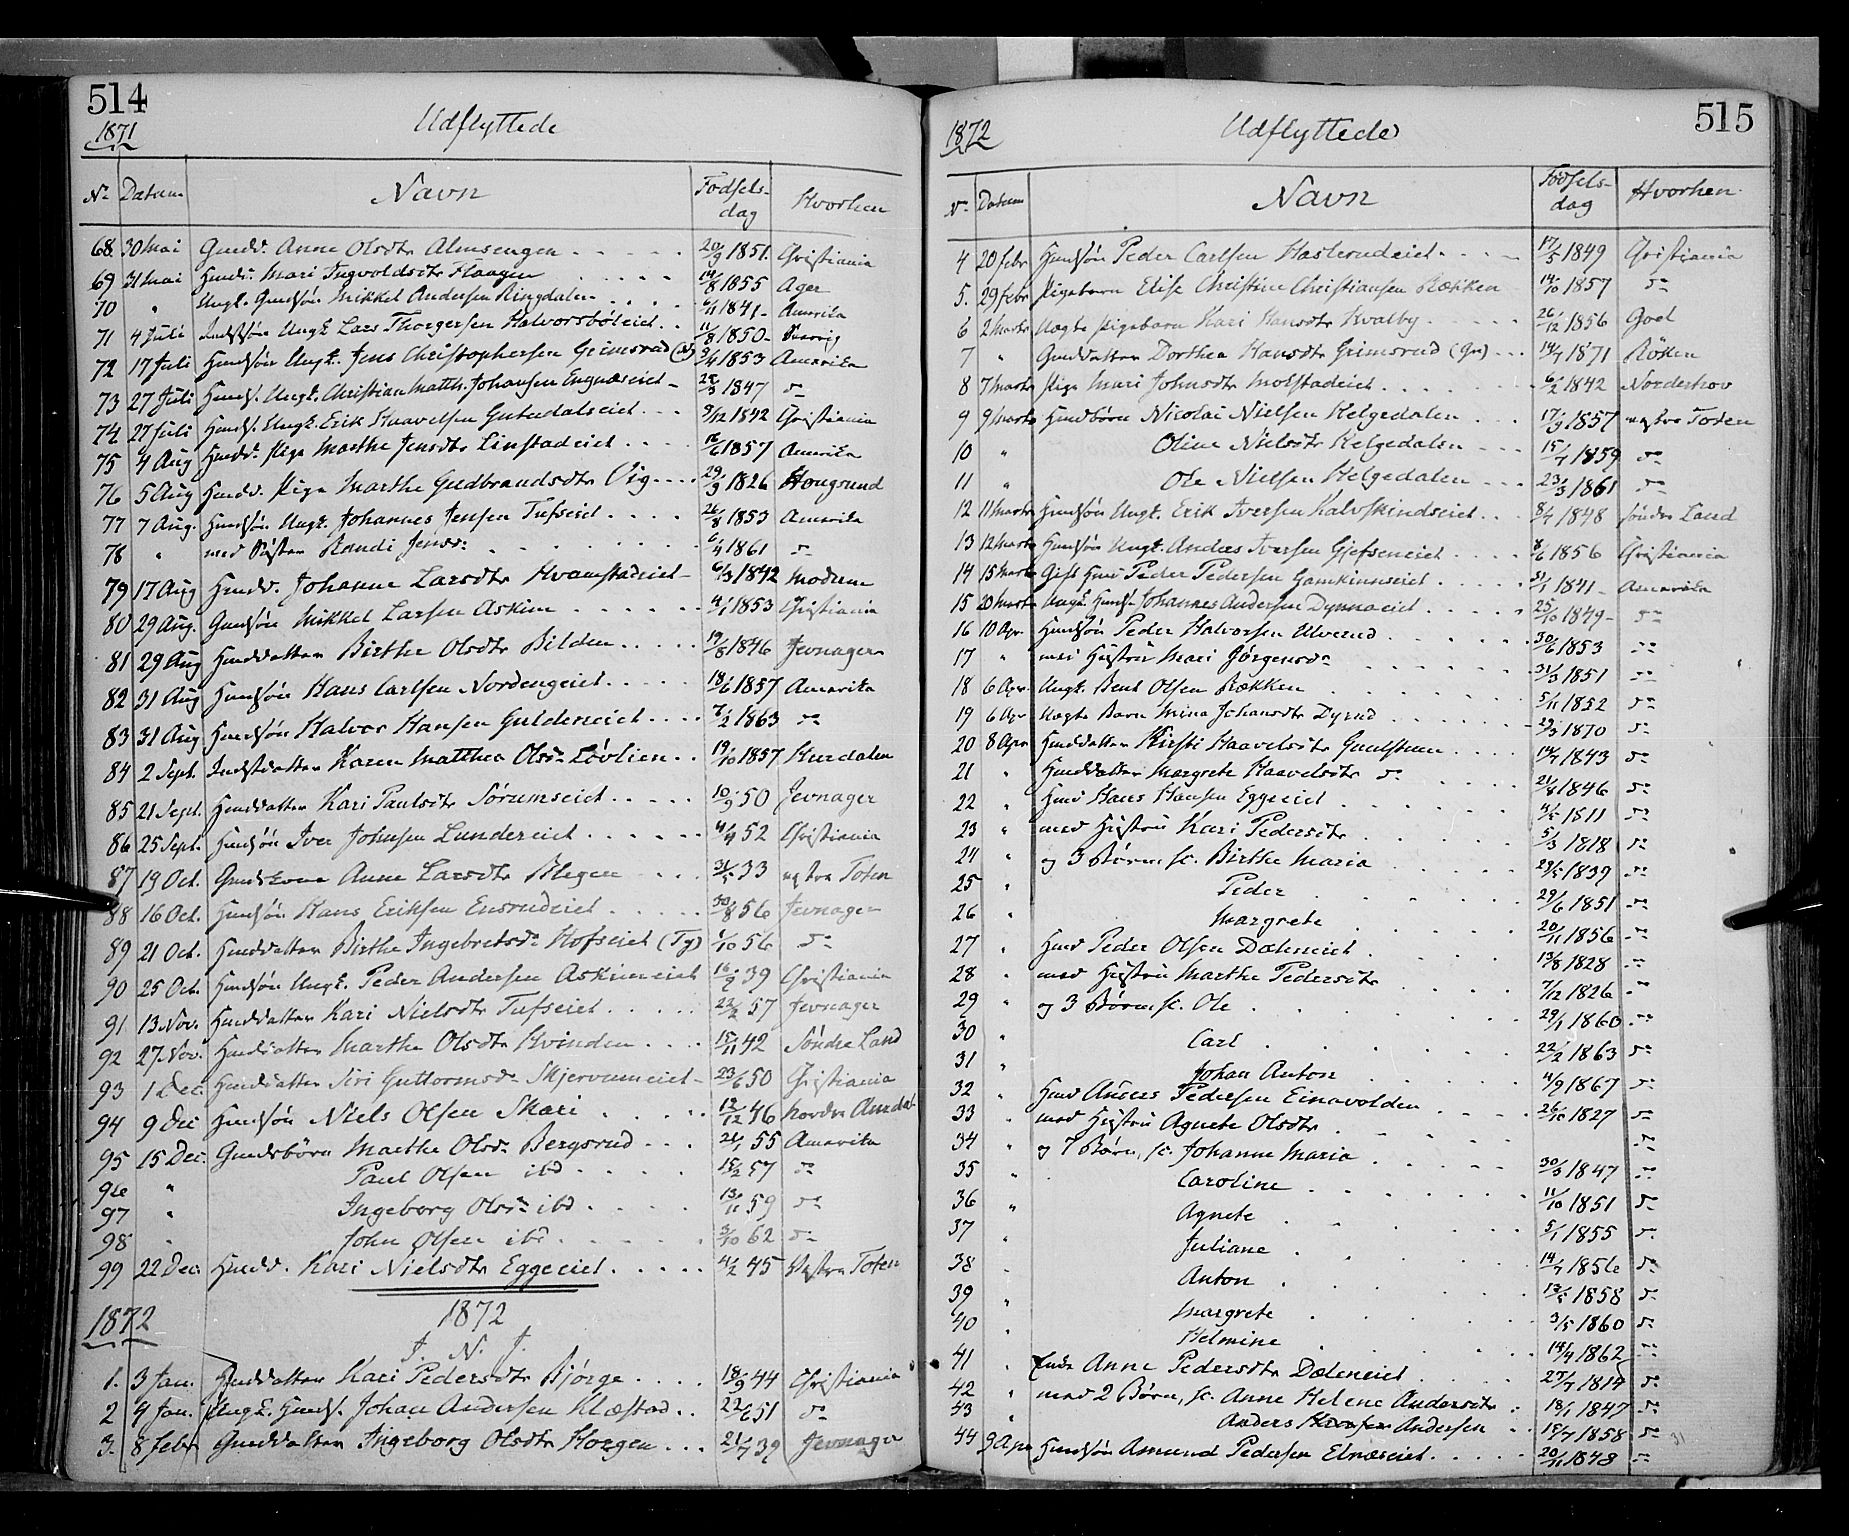 SAH, Gran prestekontor, Parish register (official) no. 12, 1856-1874, p. 514-515